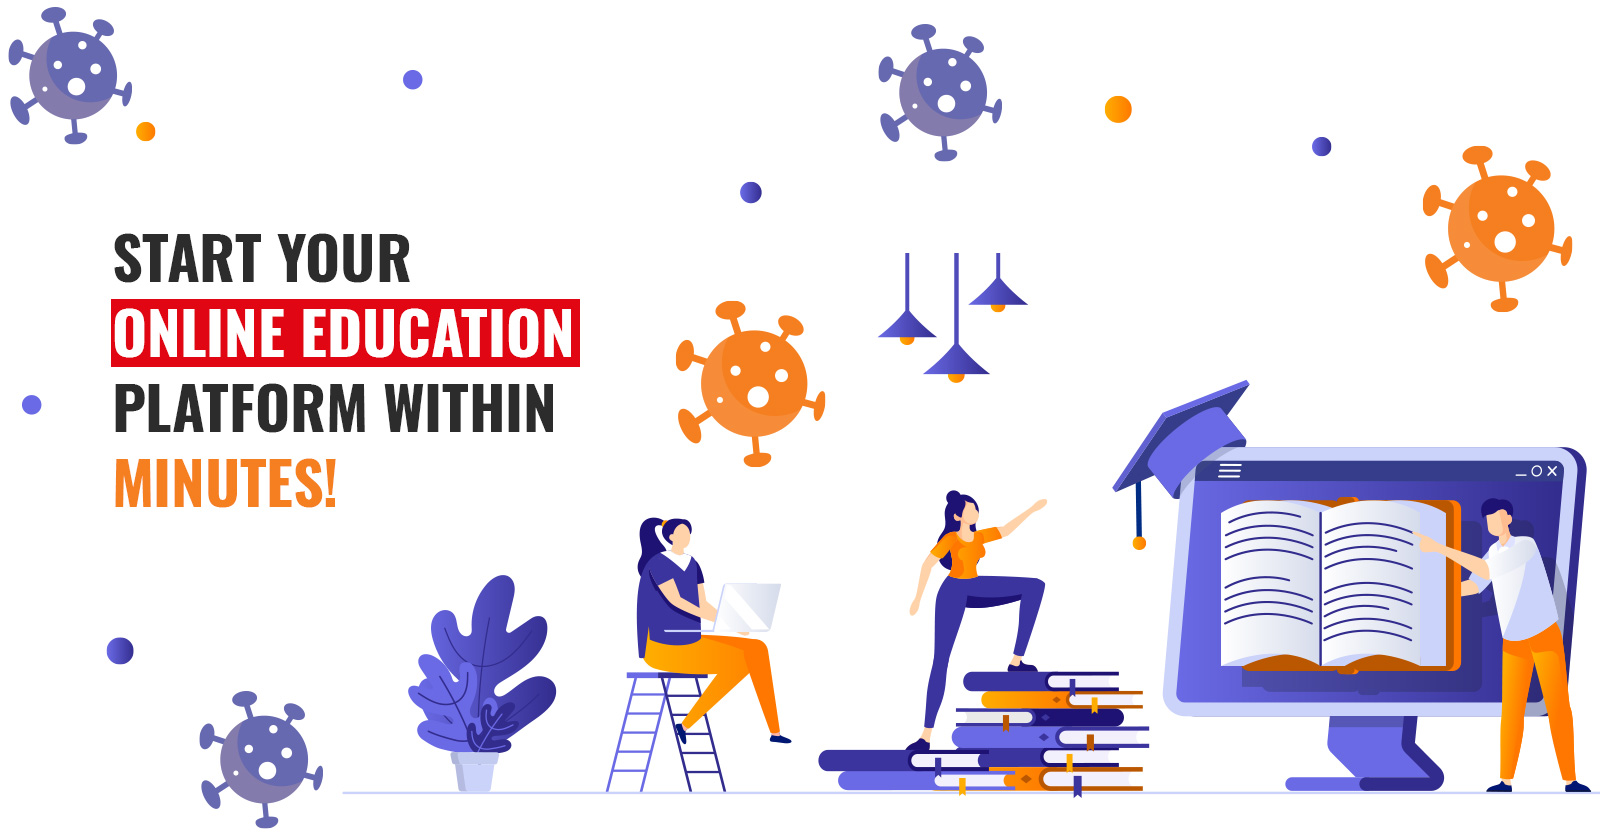 How to start an online education platform